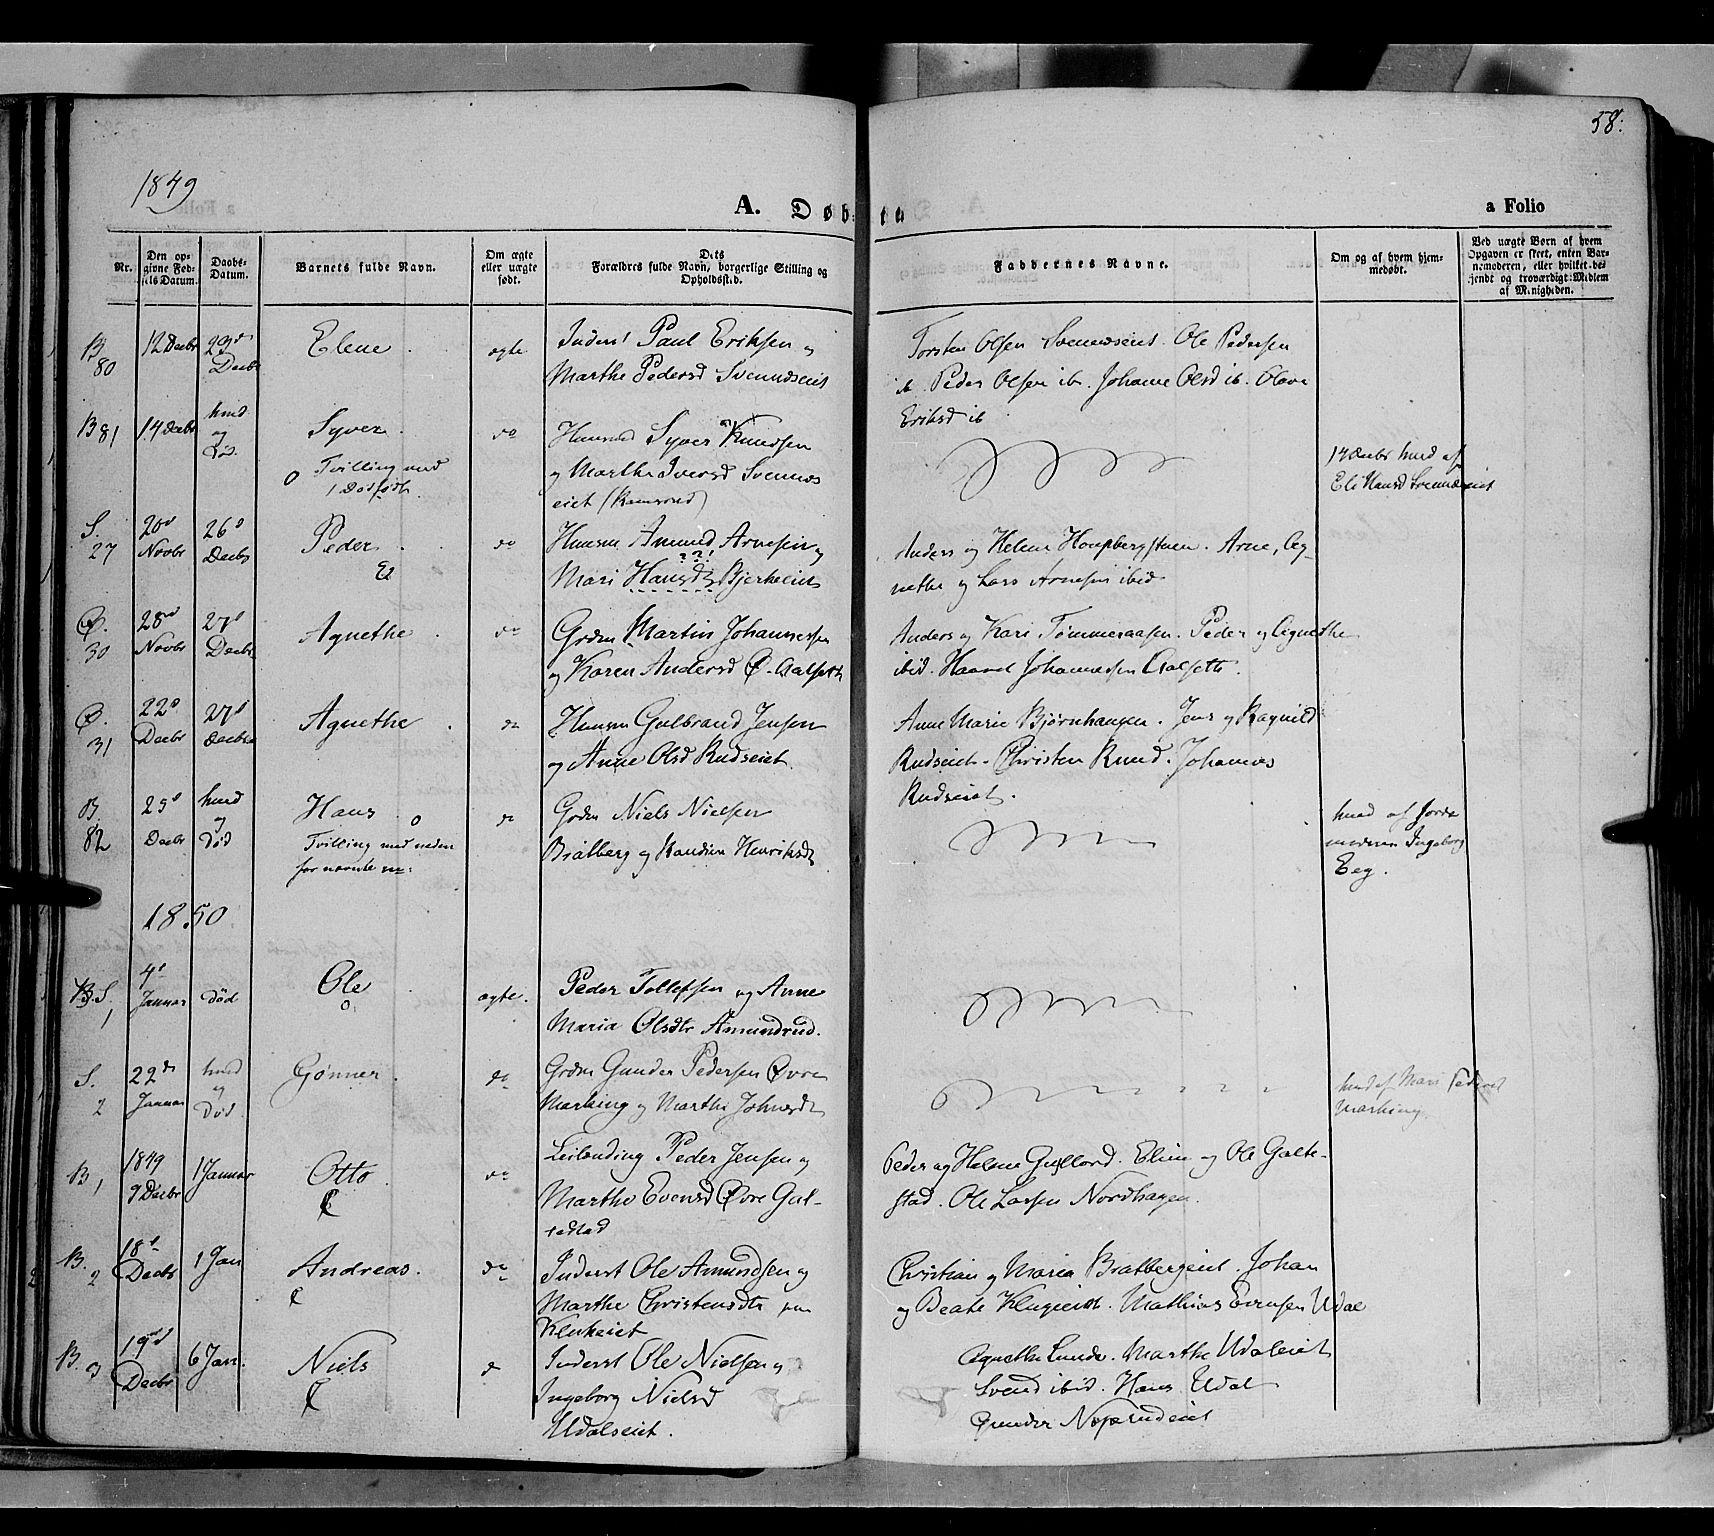 SAH, Biri prestekontor, Ministerialbok nr. 5, 1843-1854, s. 58